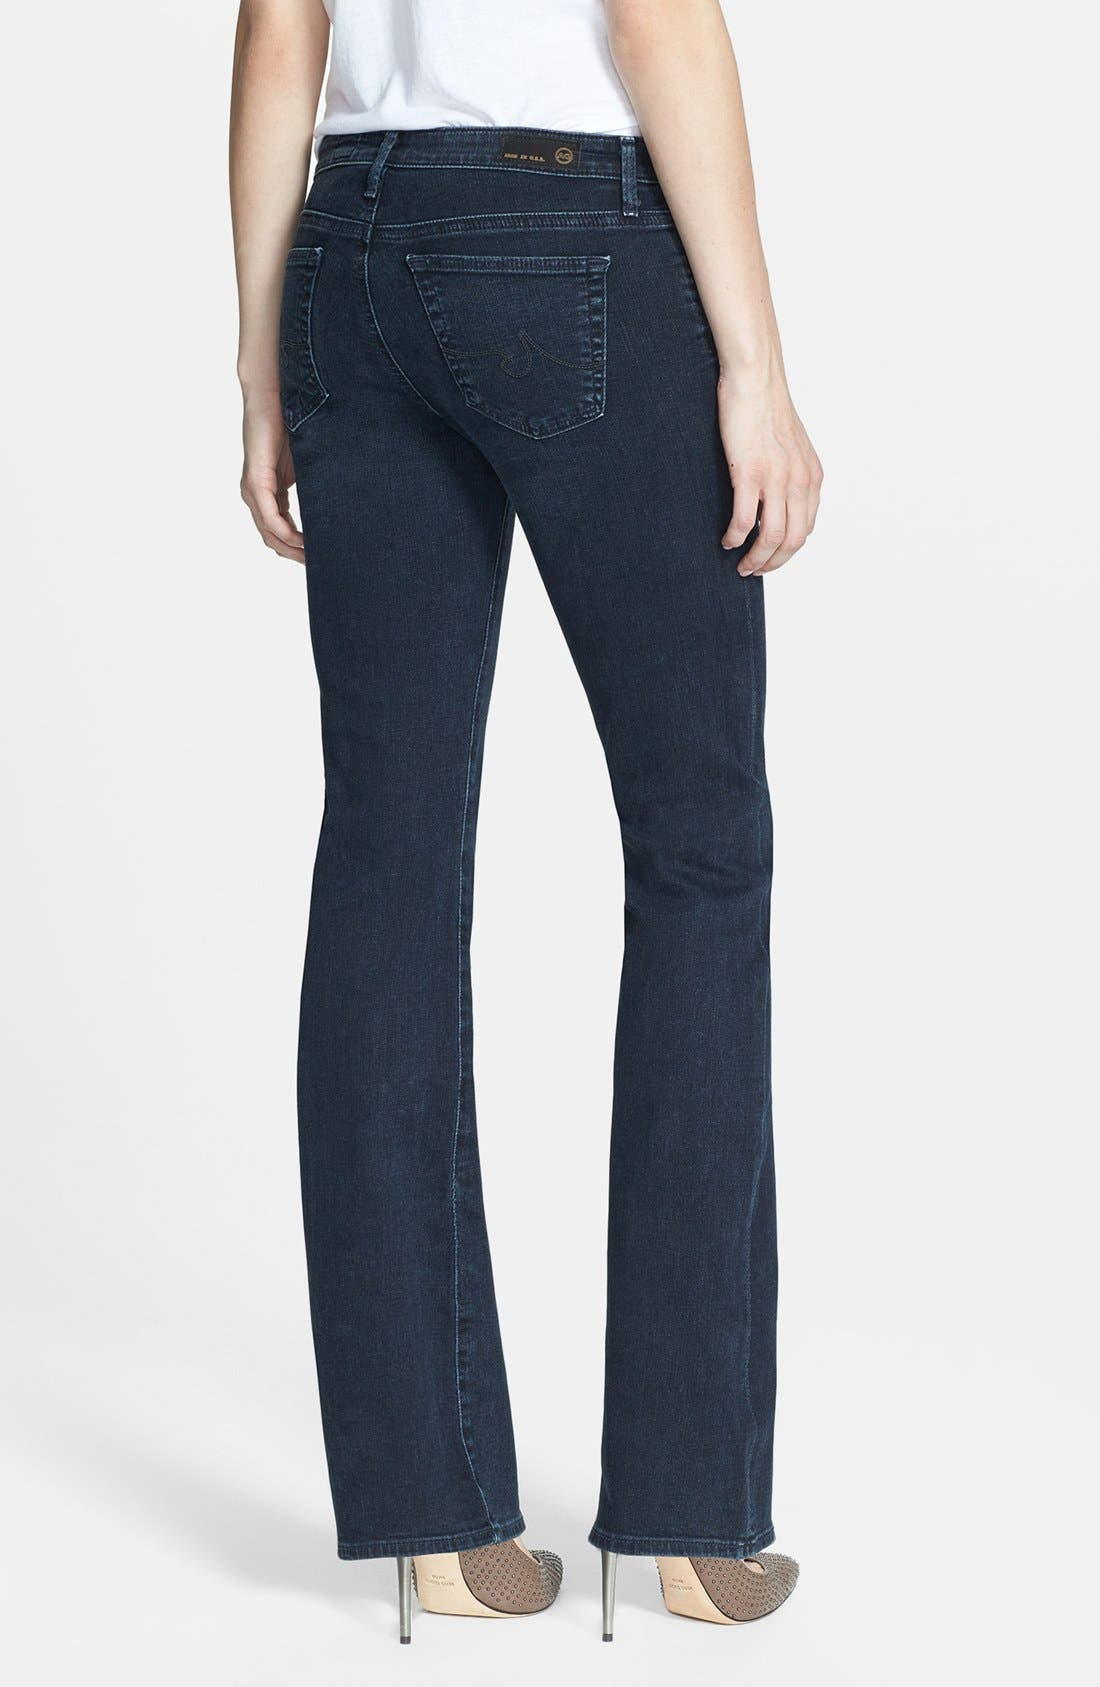 Alternate Image 2  - AG 'Angelina' Bootcut Jeans (Smitten) (Petite)